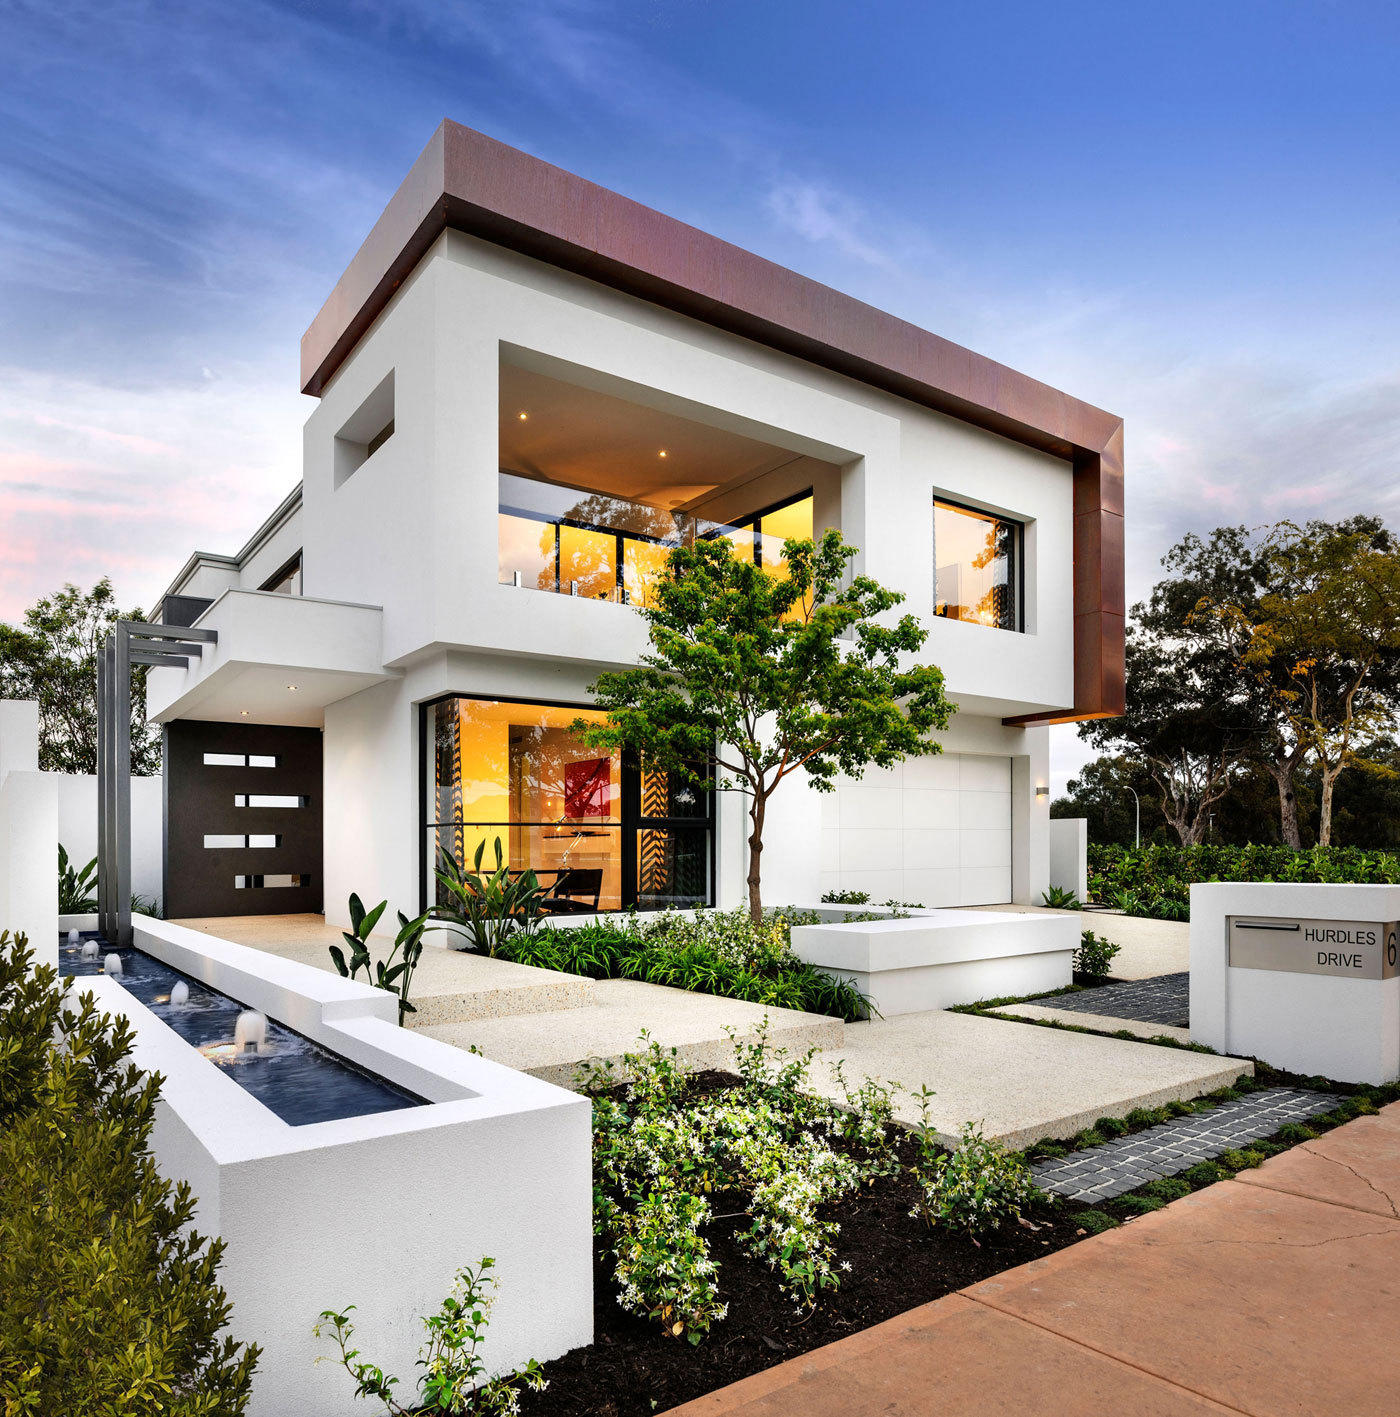 55 Best Modern House Plan Ideas For 2018: 现代简约别墅设计图_农村现代别墅设计图_国外现代简约别墅-圈子花园图片